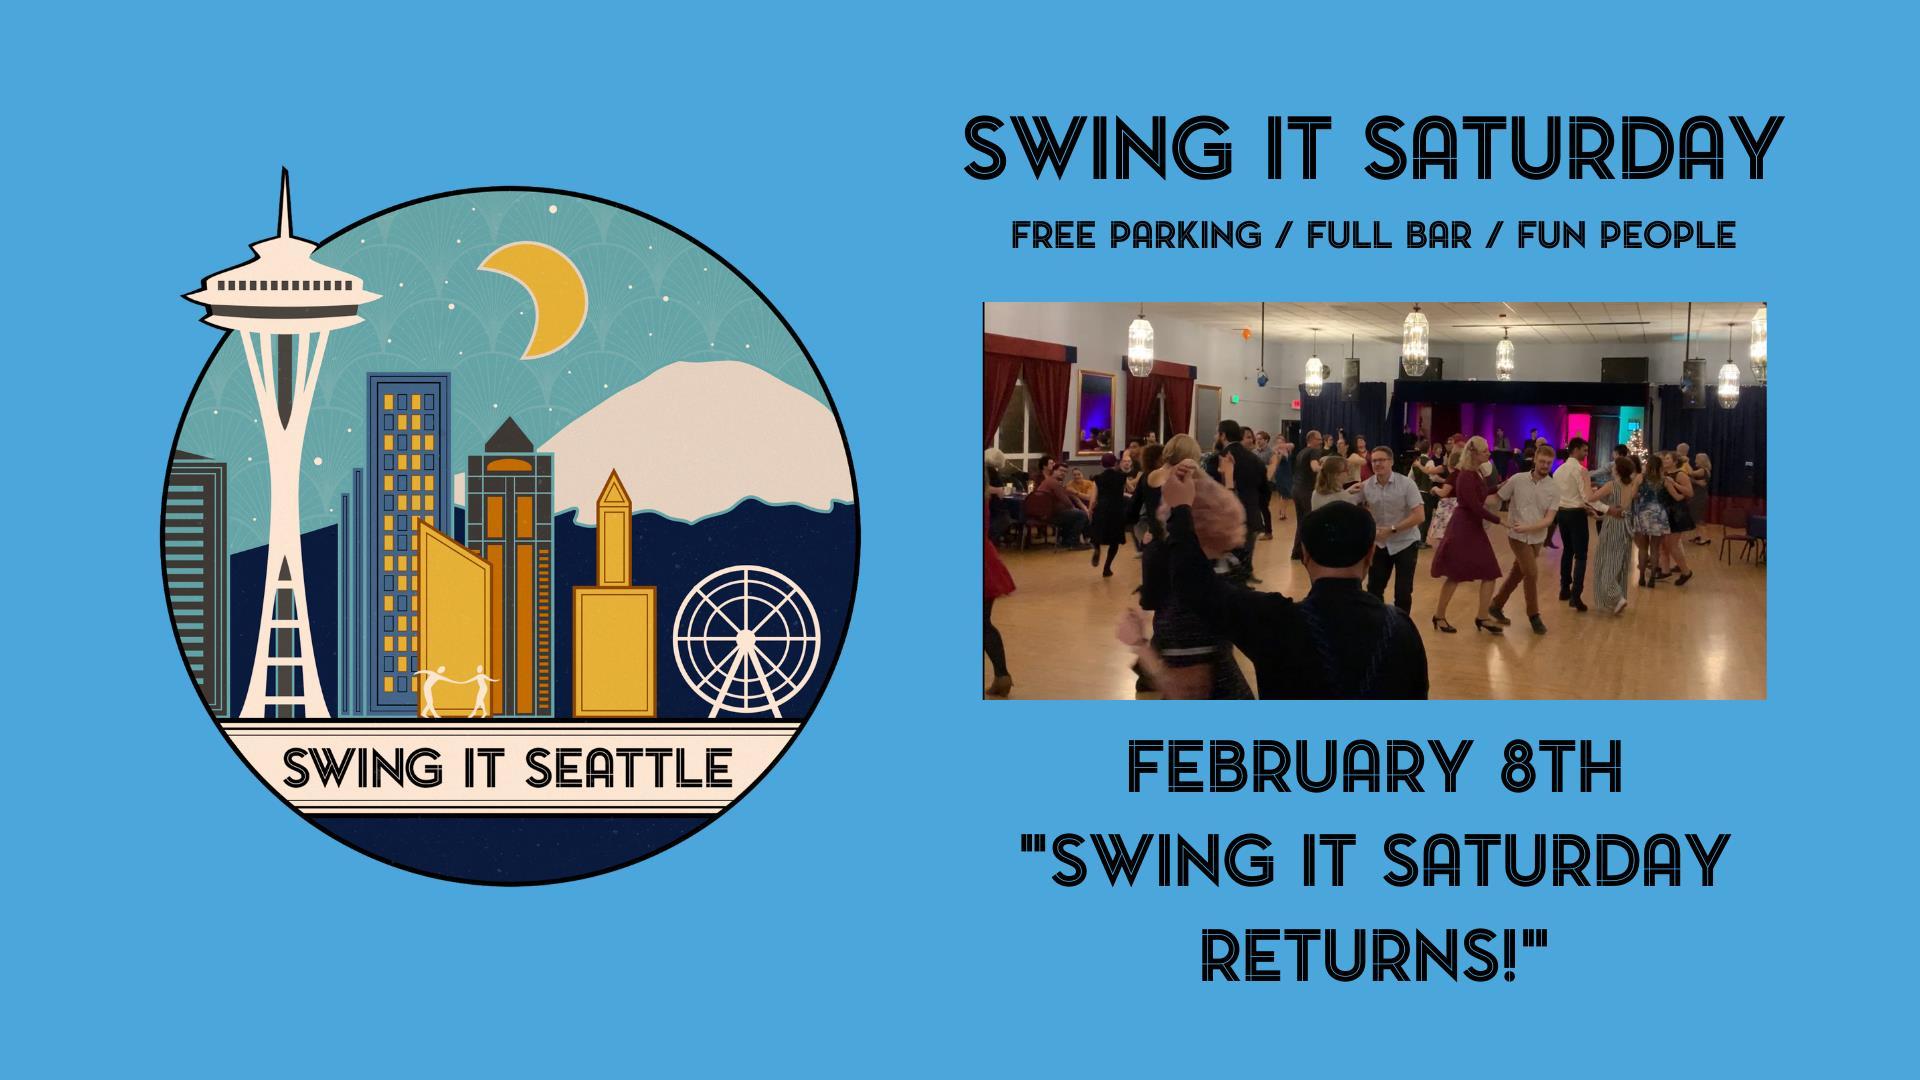 Swing It Saturday Returns!